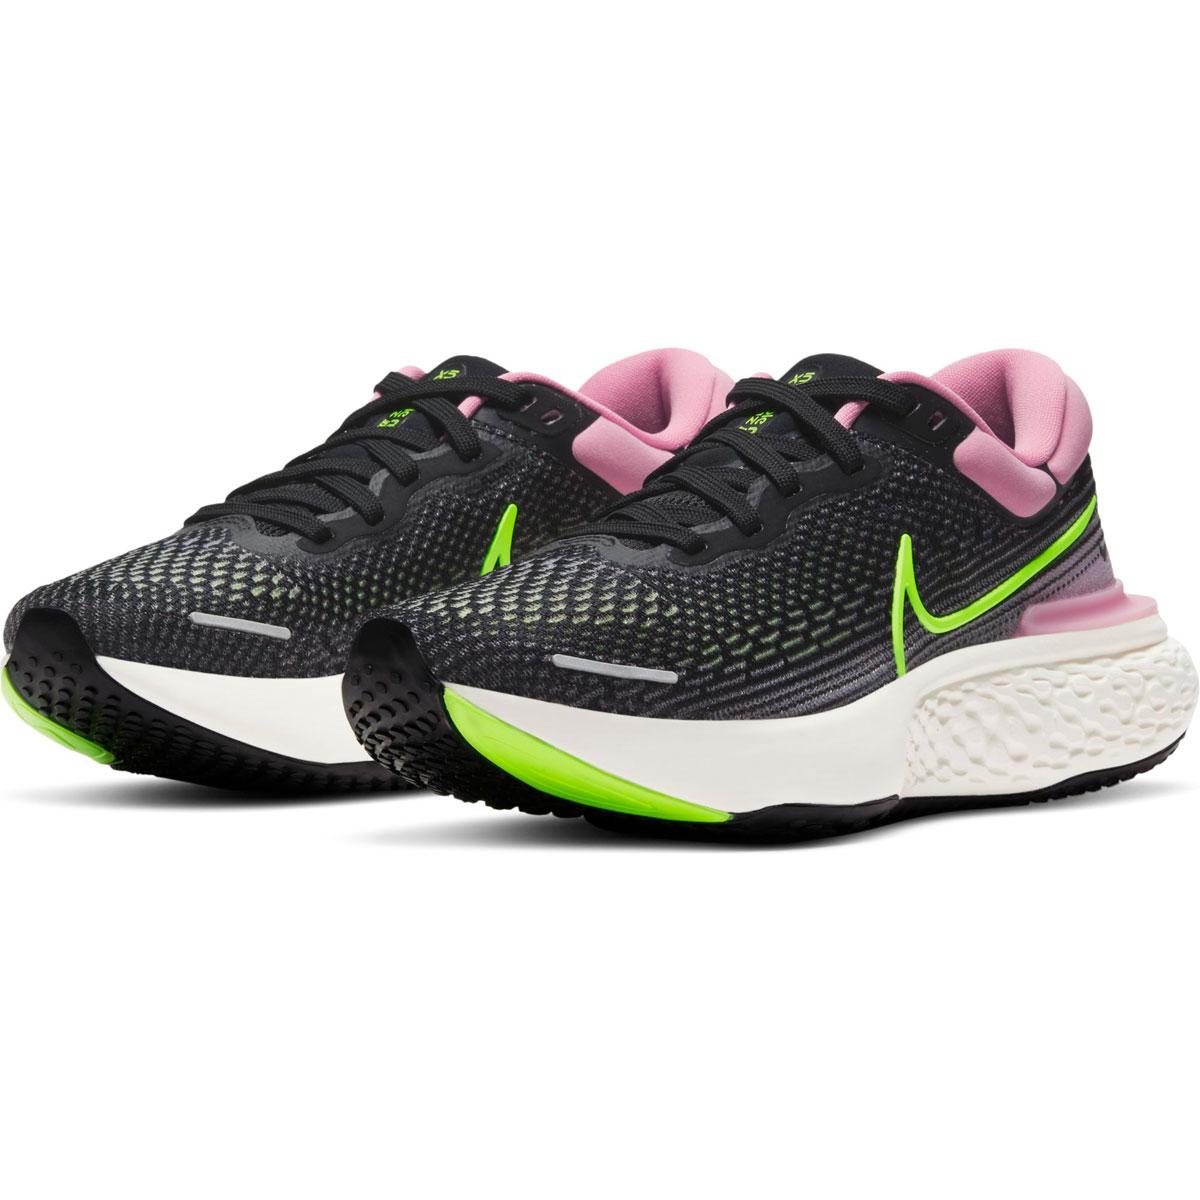 Women's Nike Zoomx Invincible Run FlyKnit Running Shoe - Color: Black/Cyber/Elemental Pink - Size: 6 - Width: Regular, Black/Cyber/Elemental Pink, large, image 4